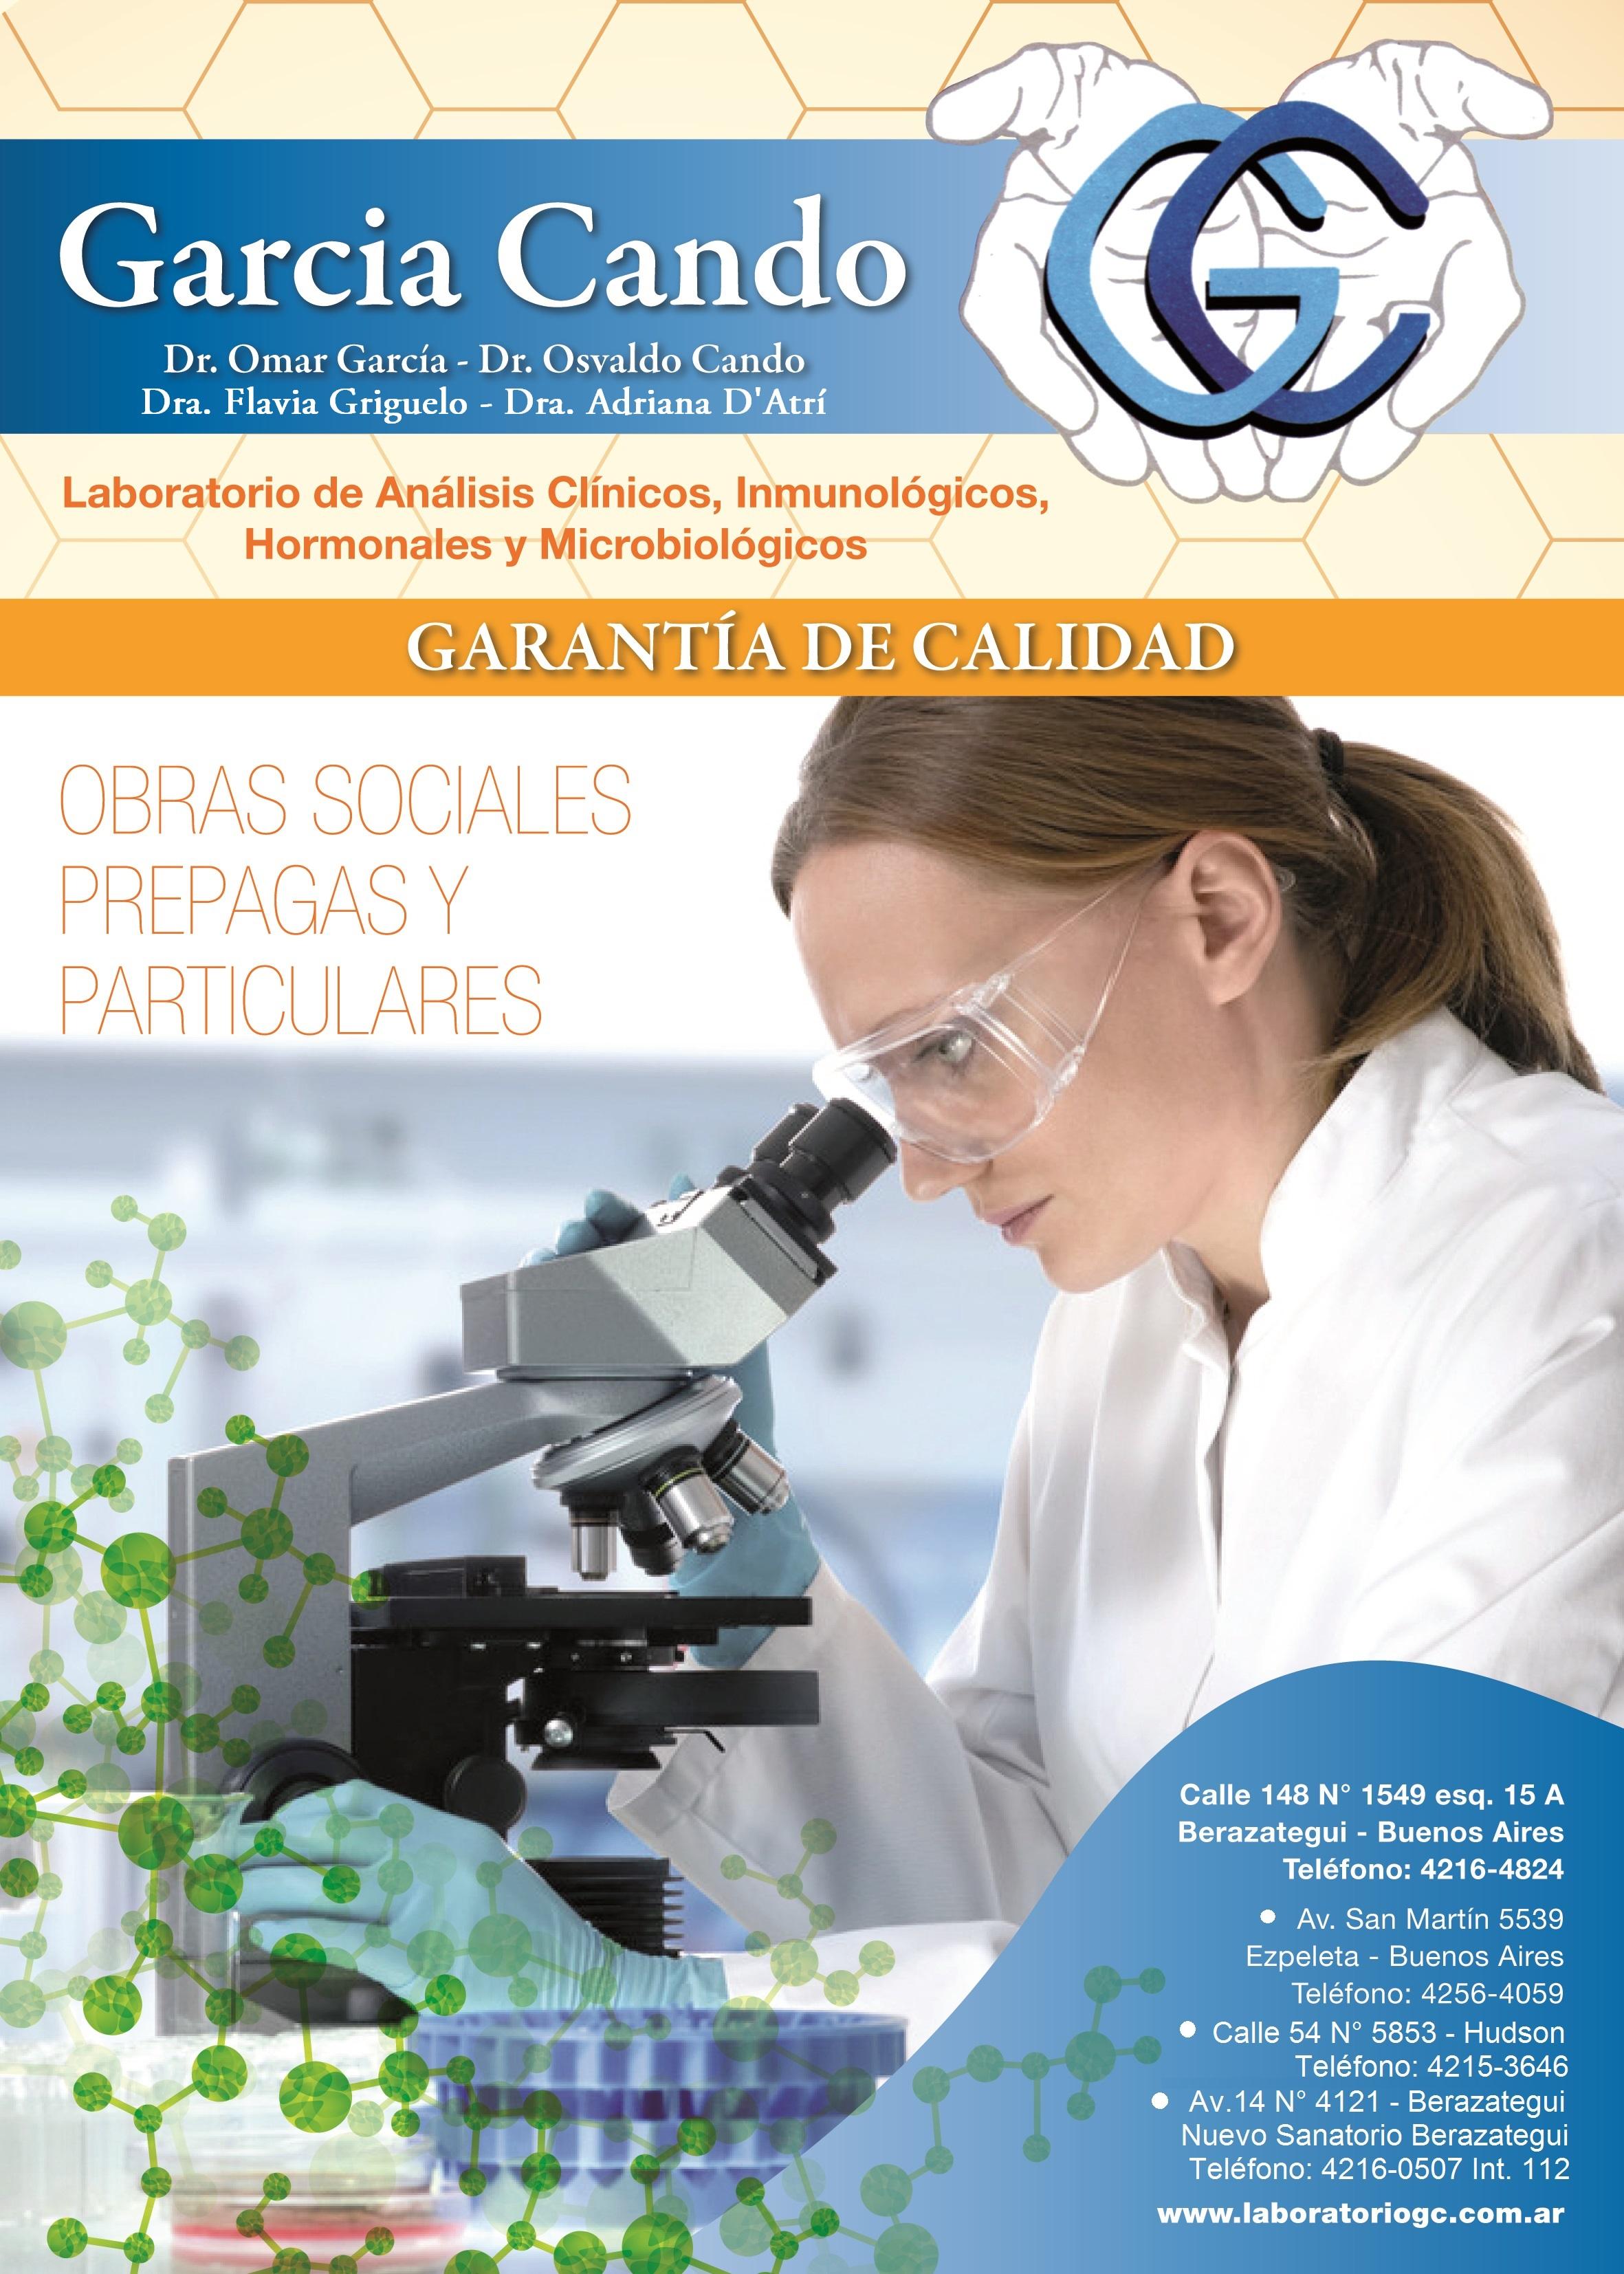 Laboratorio GC, analisis clinicos